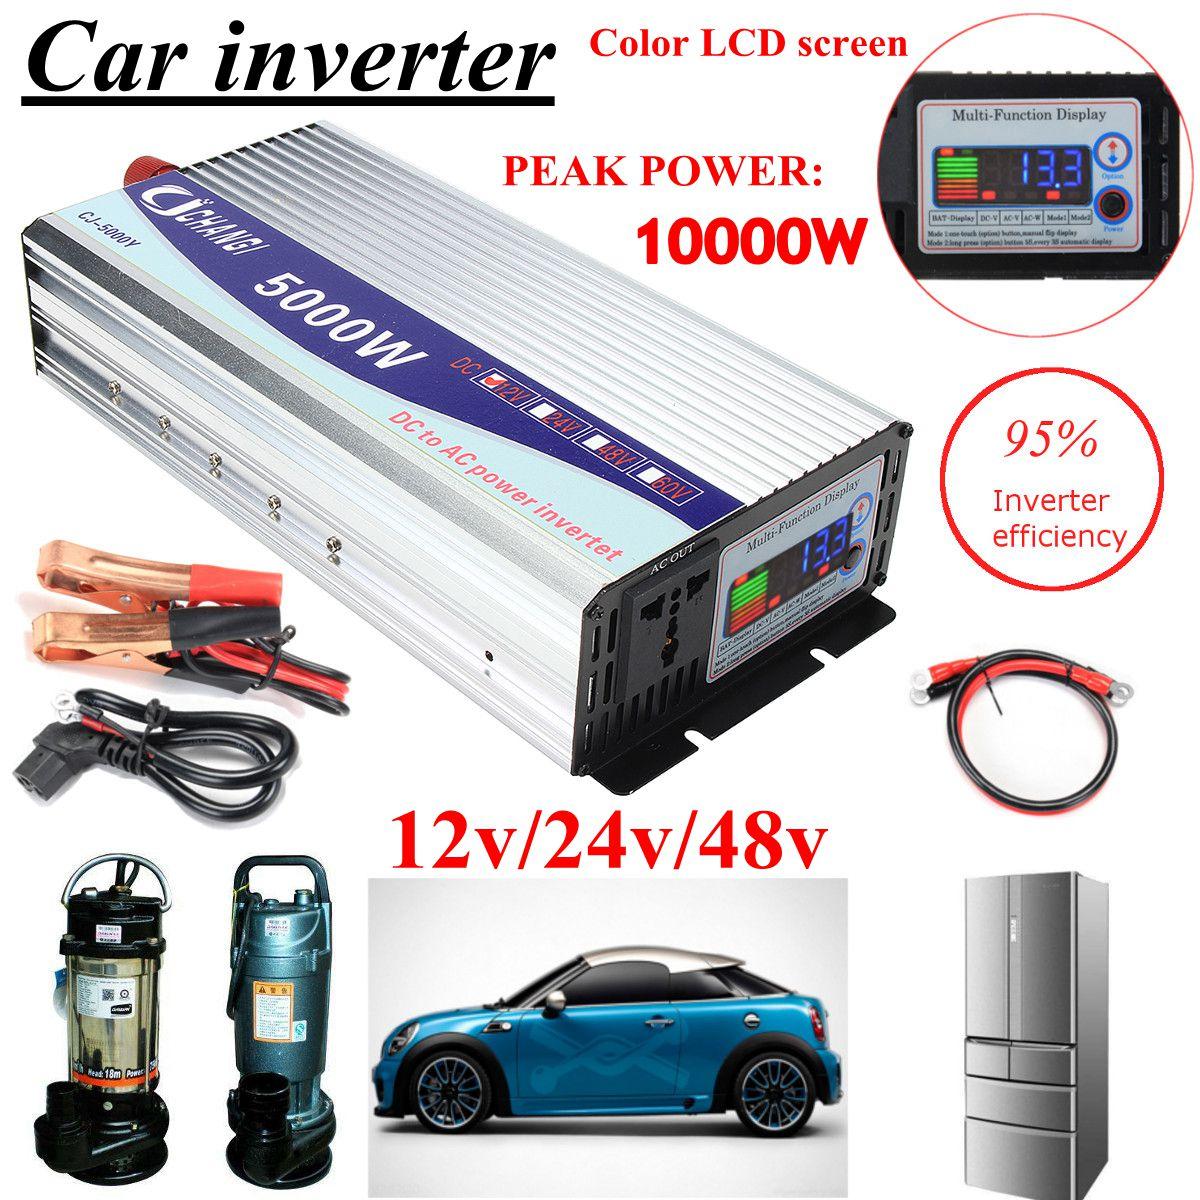 Onduleur 12 V/24 V/48 V 220V 5000W 10000W pics onduleur à onde sinusoïdale modifiée transformateur de tension convertisseur + écran LCD - 2